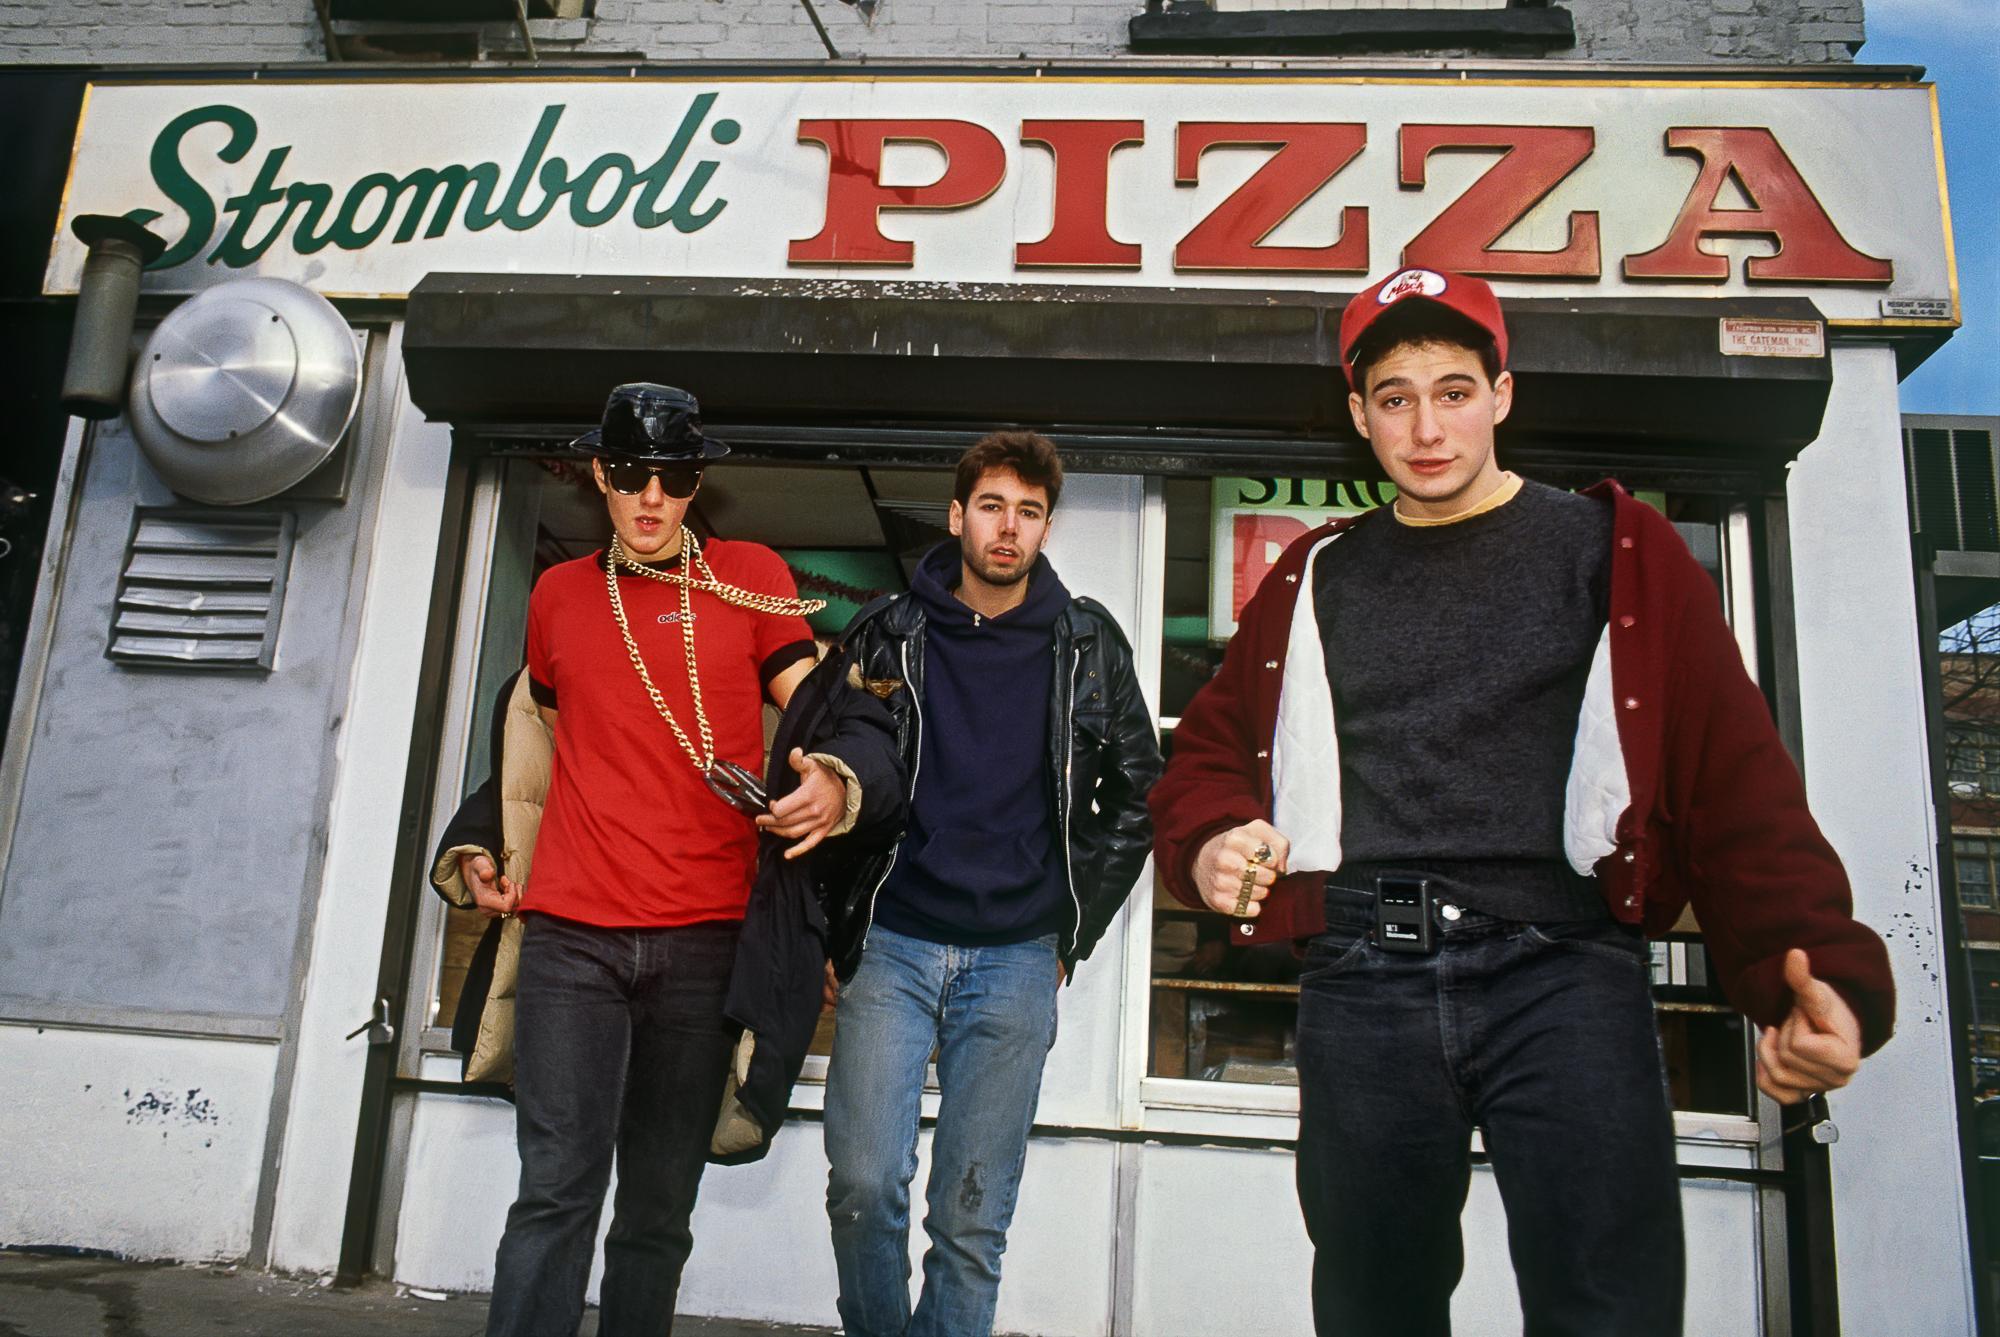 BEASTIE BOYS, 1986 STROMBOLI PIZZA